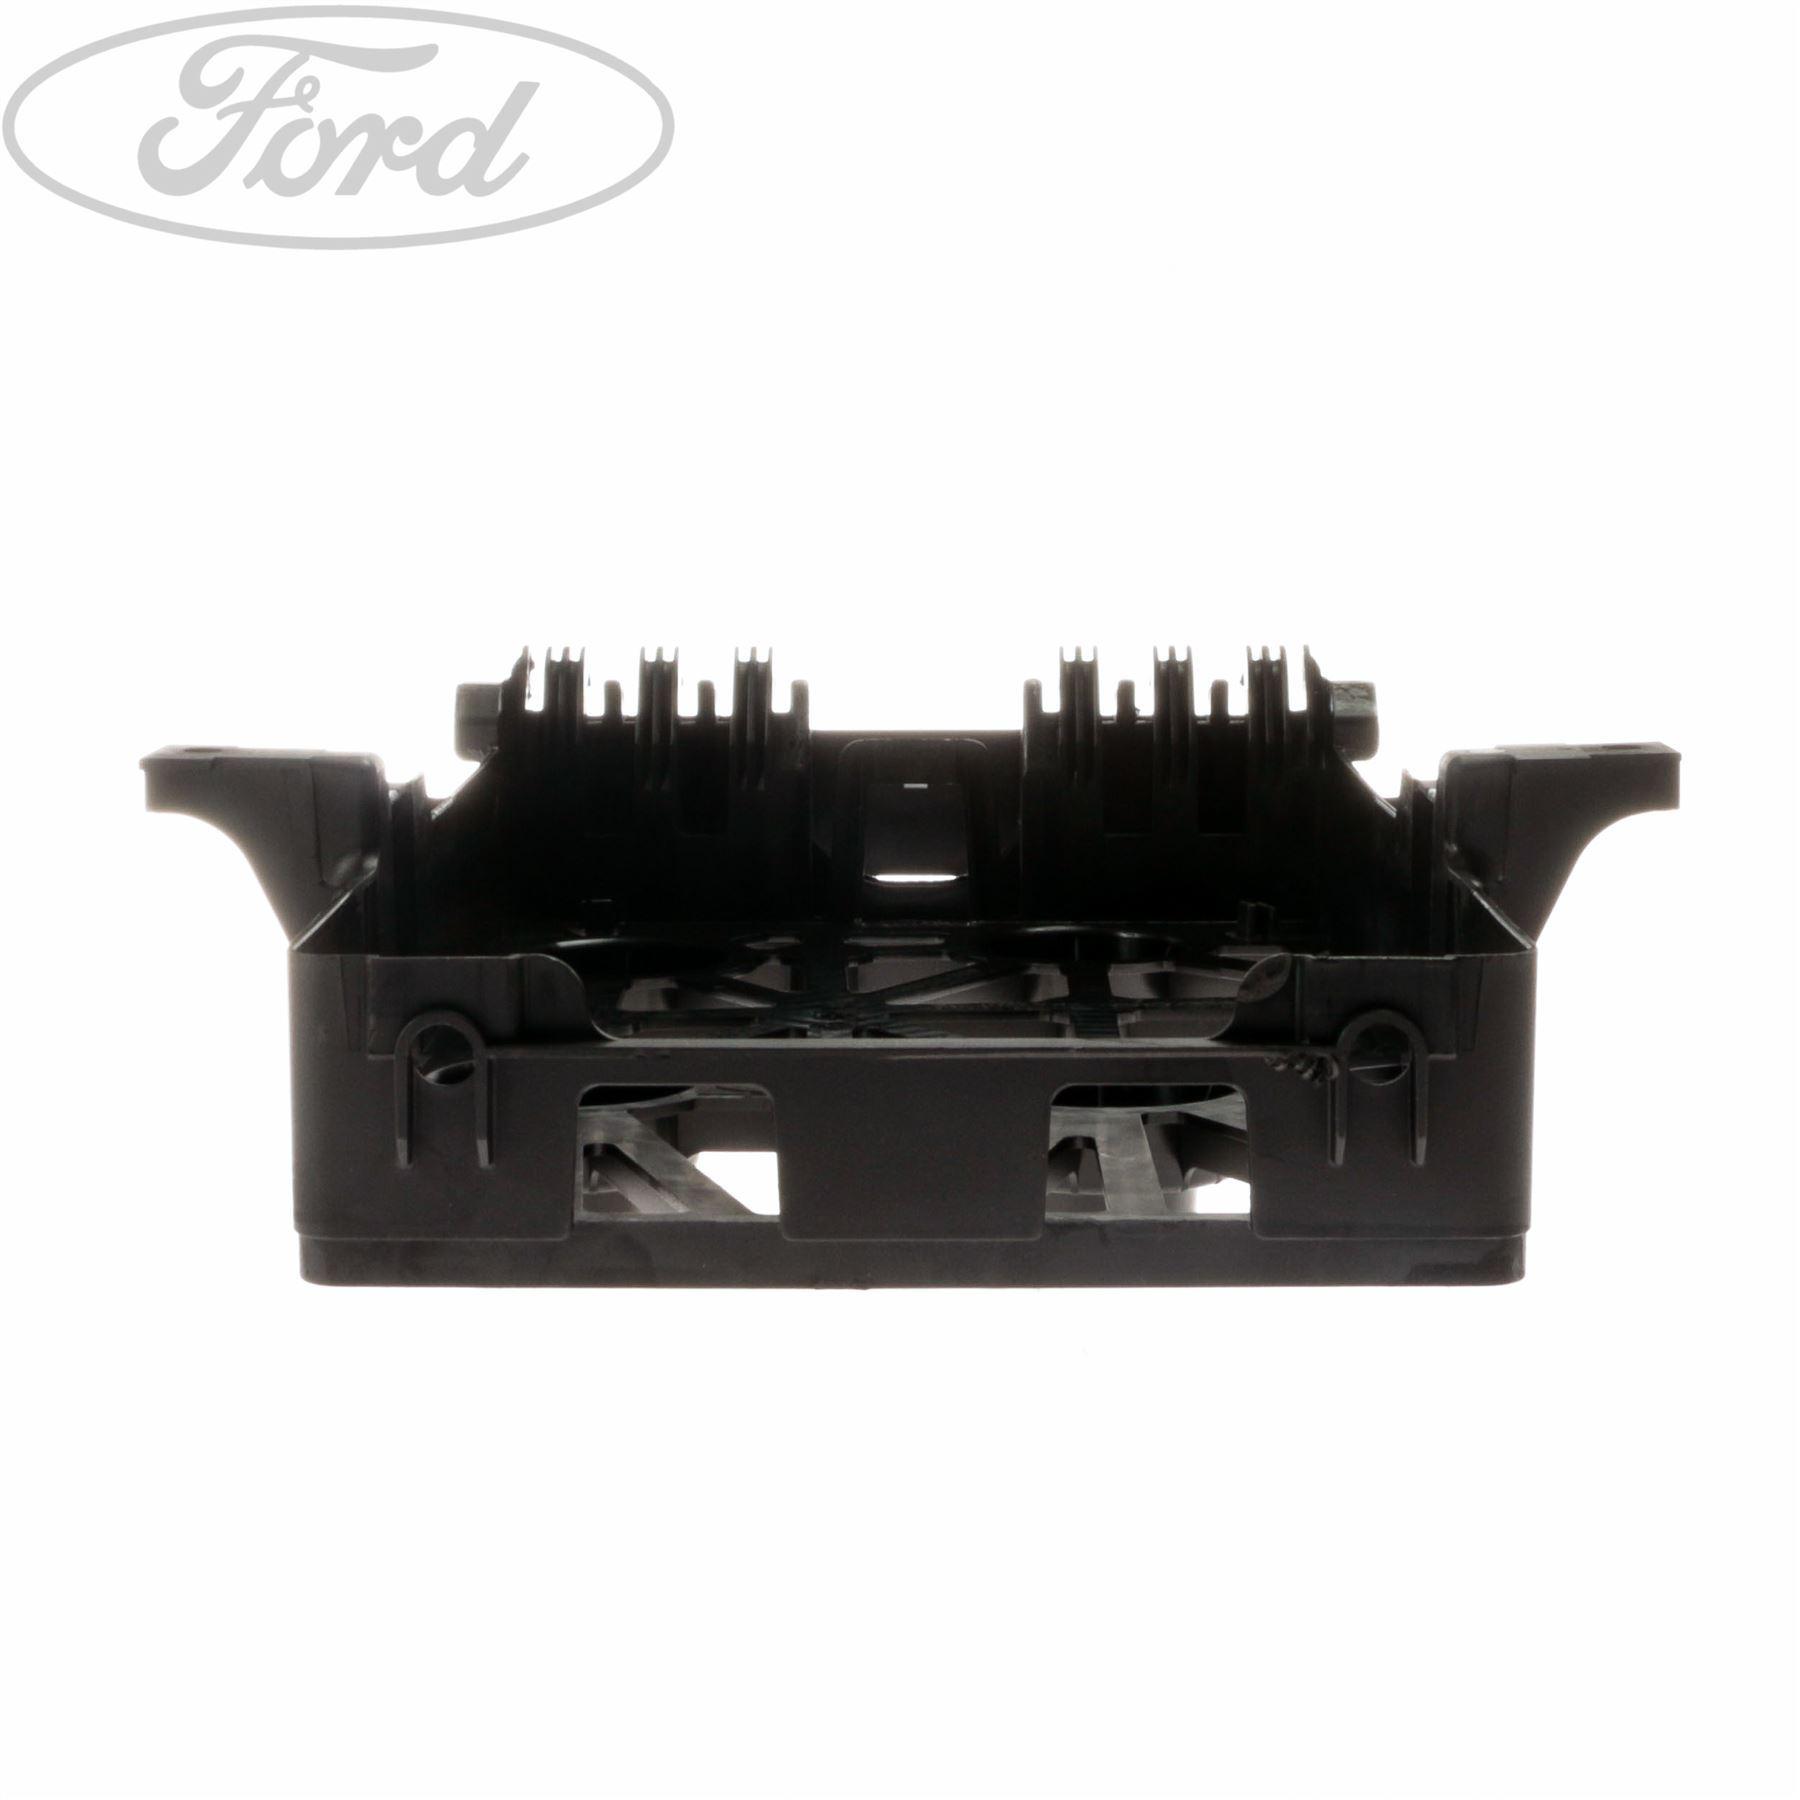 hight resolution of genuine ford transit mk 7 fuse box bracket 1434704